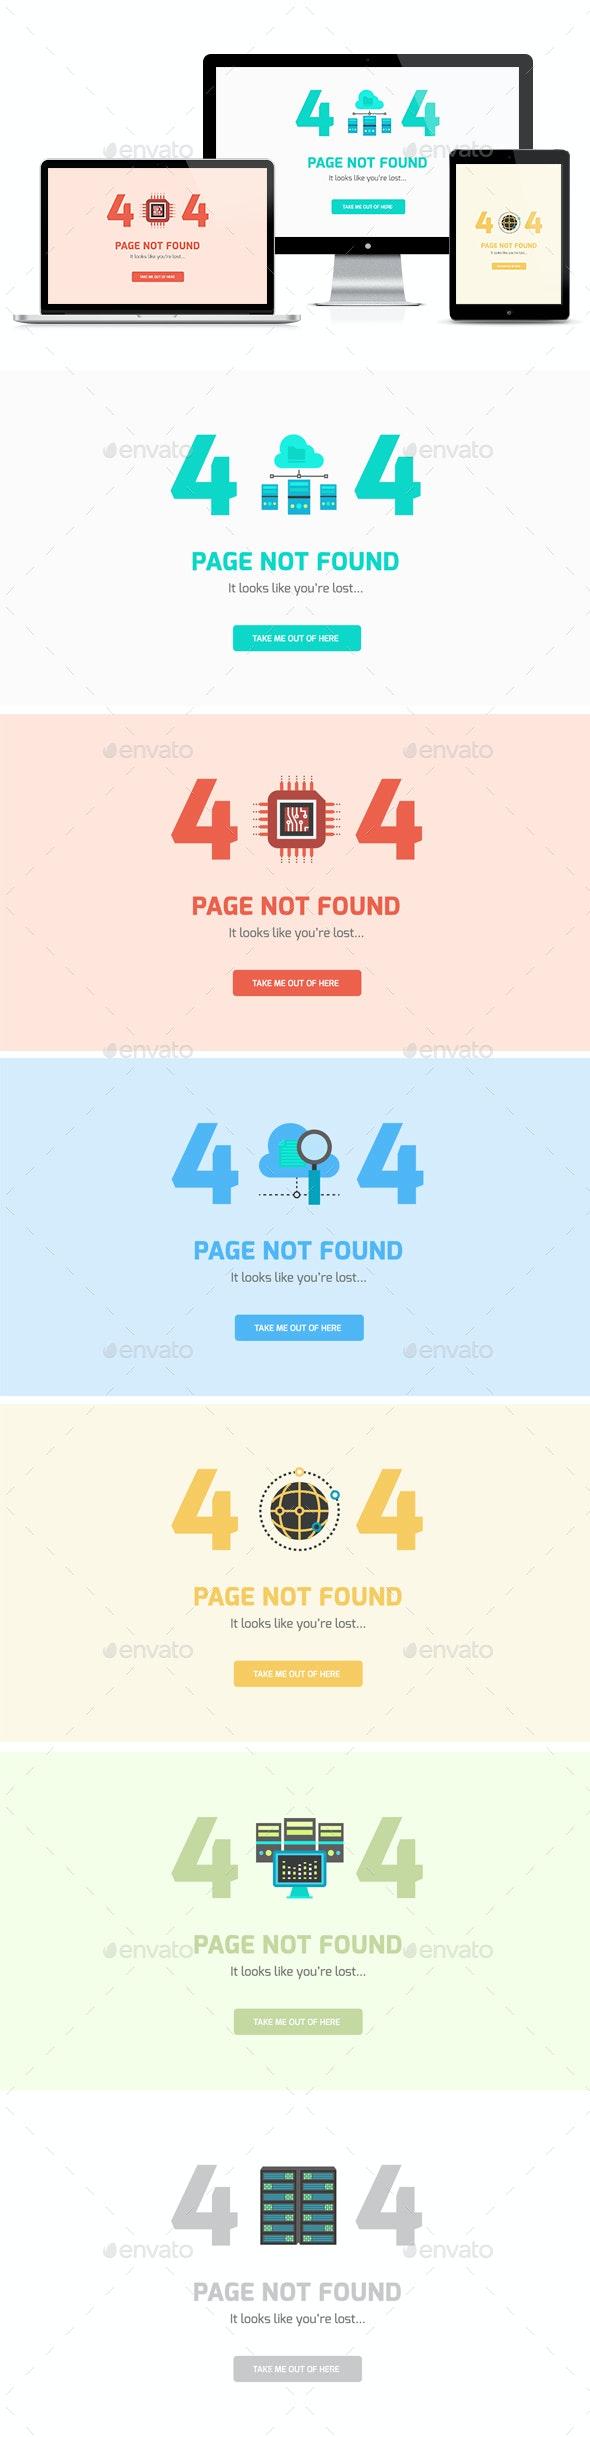 404 Error Webpages - Flat UI Design - 6 items - PSD